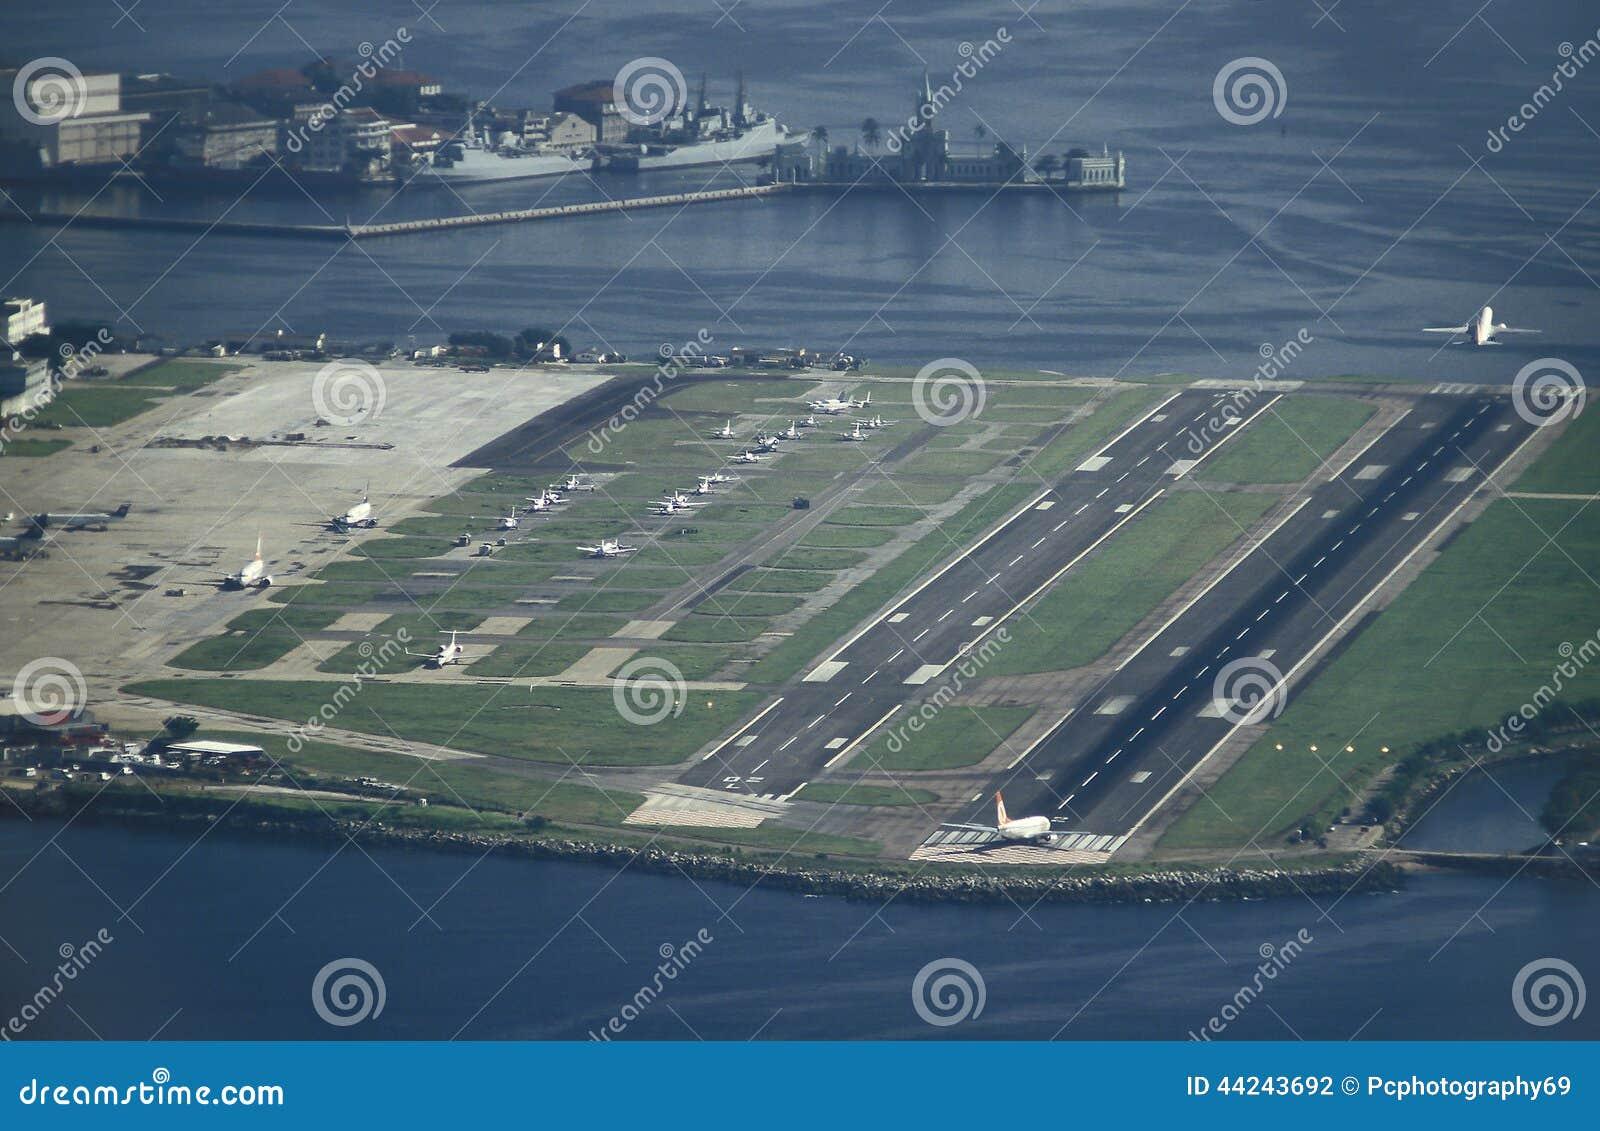 A >> Santo Dumont Airport, Rio De Janeiro. Stock Photo - Image: 44243692